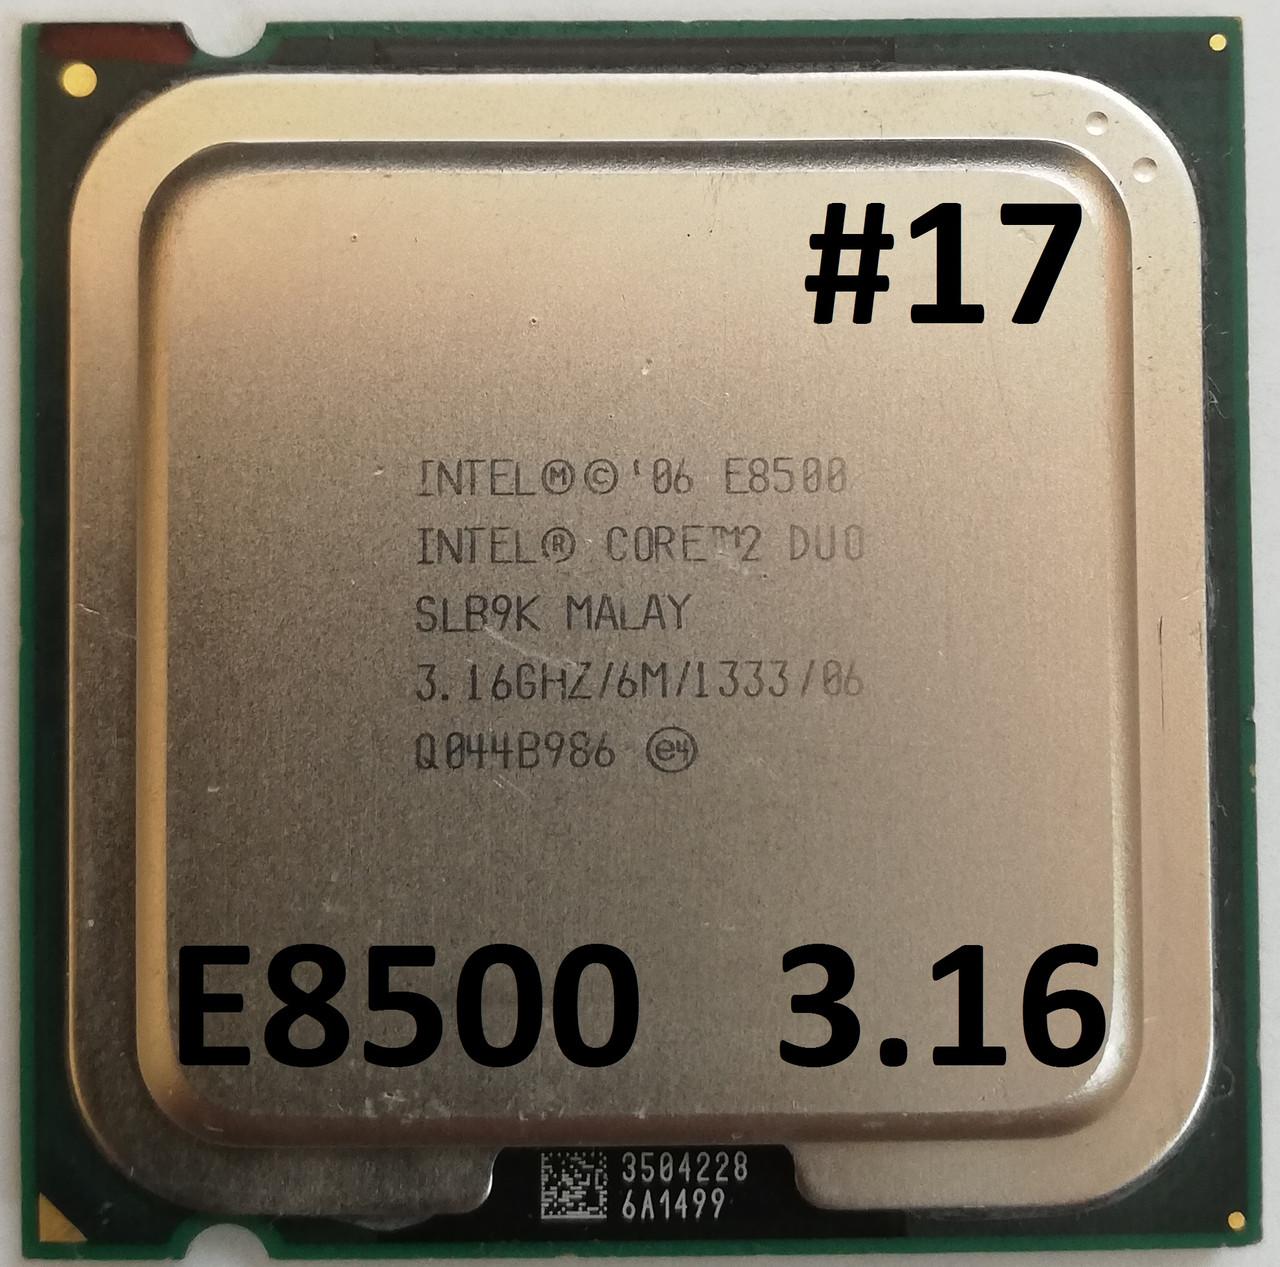 Процессор ЛОТ #17 Intel Core 2 Duo E8500 E0 SLB9K 3.16 GHz 6 MB Cache 1333 MHz FSB Socket 775 Б/У